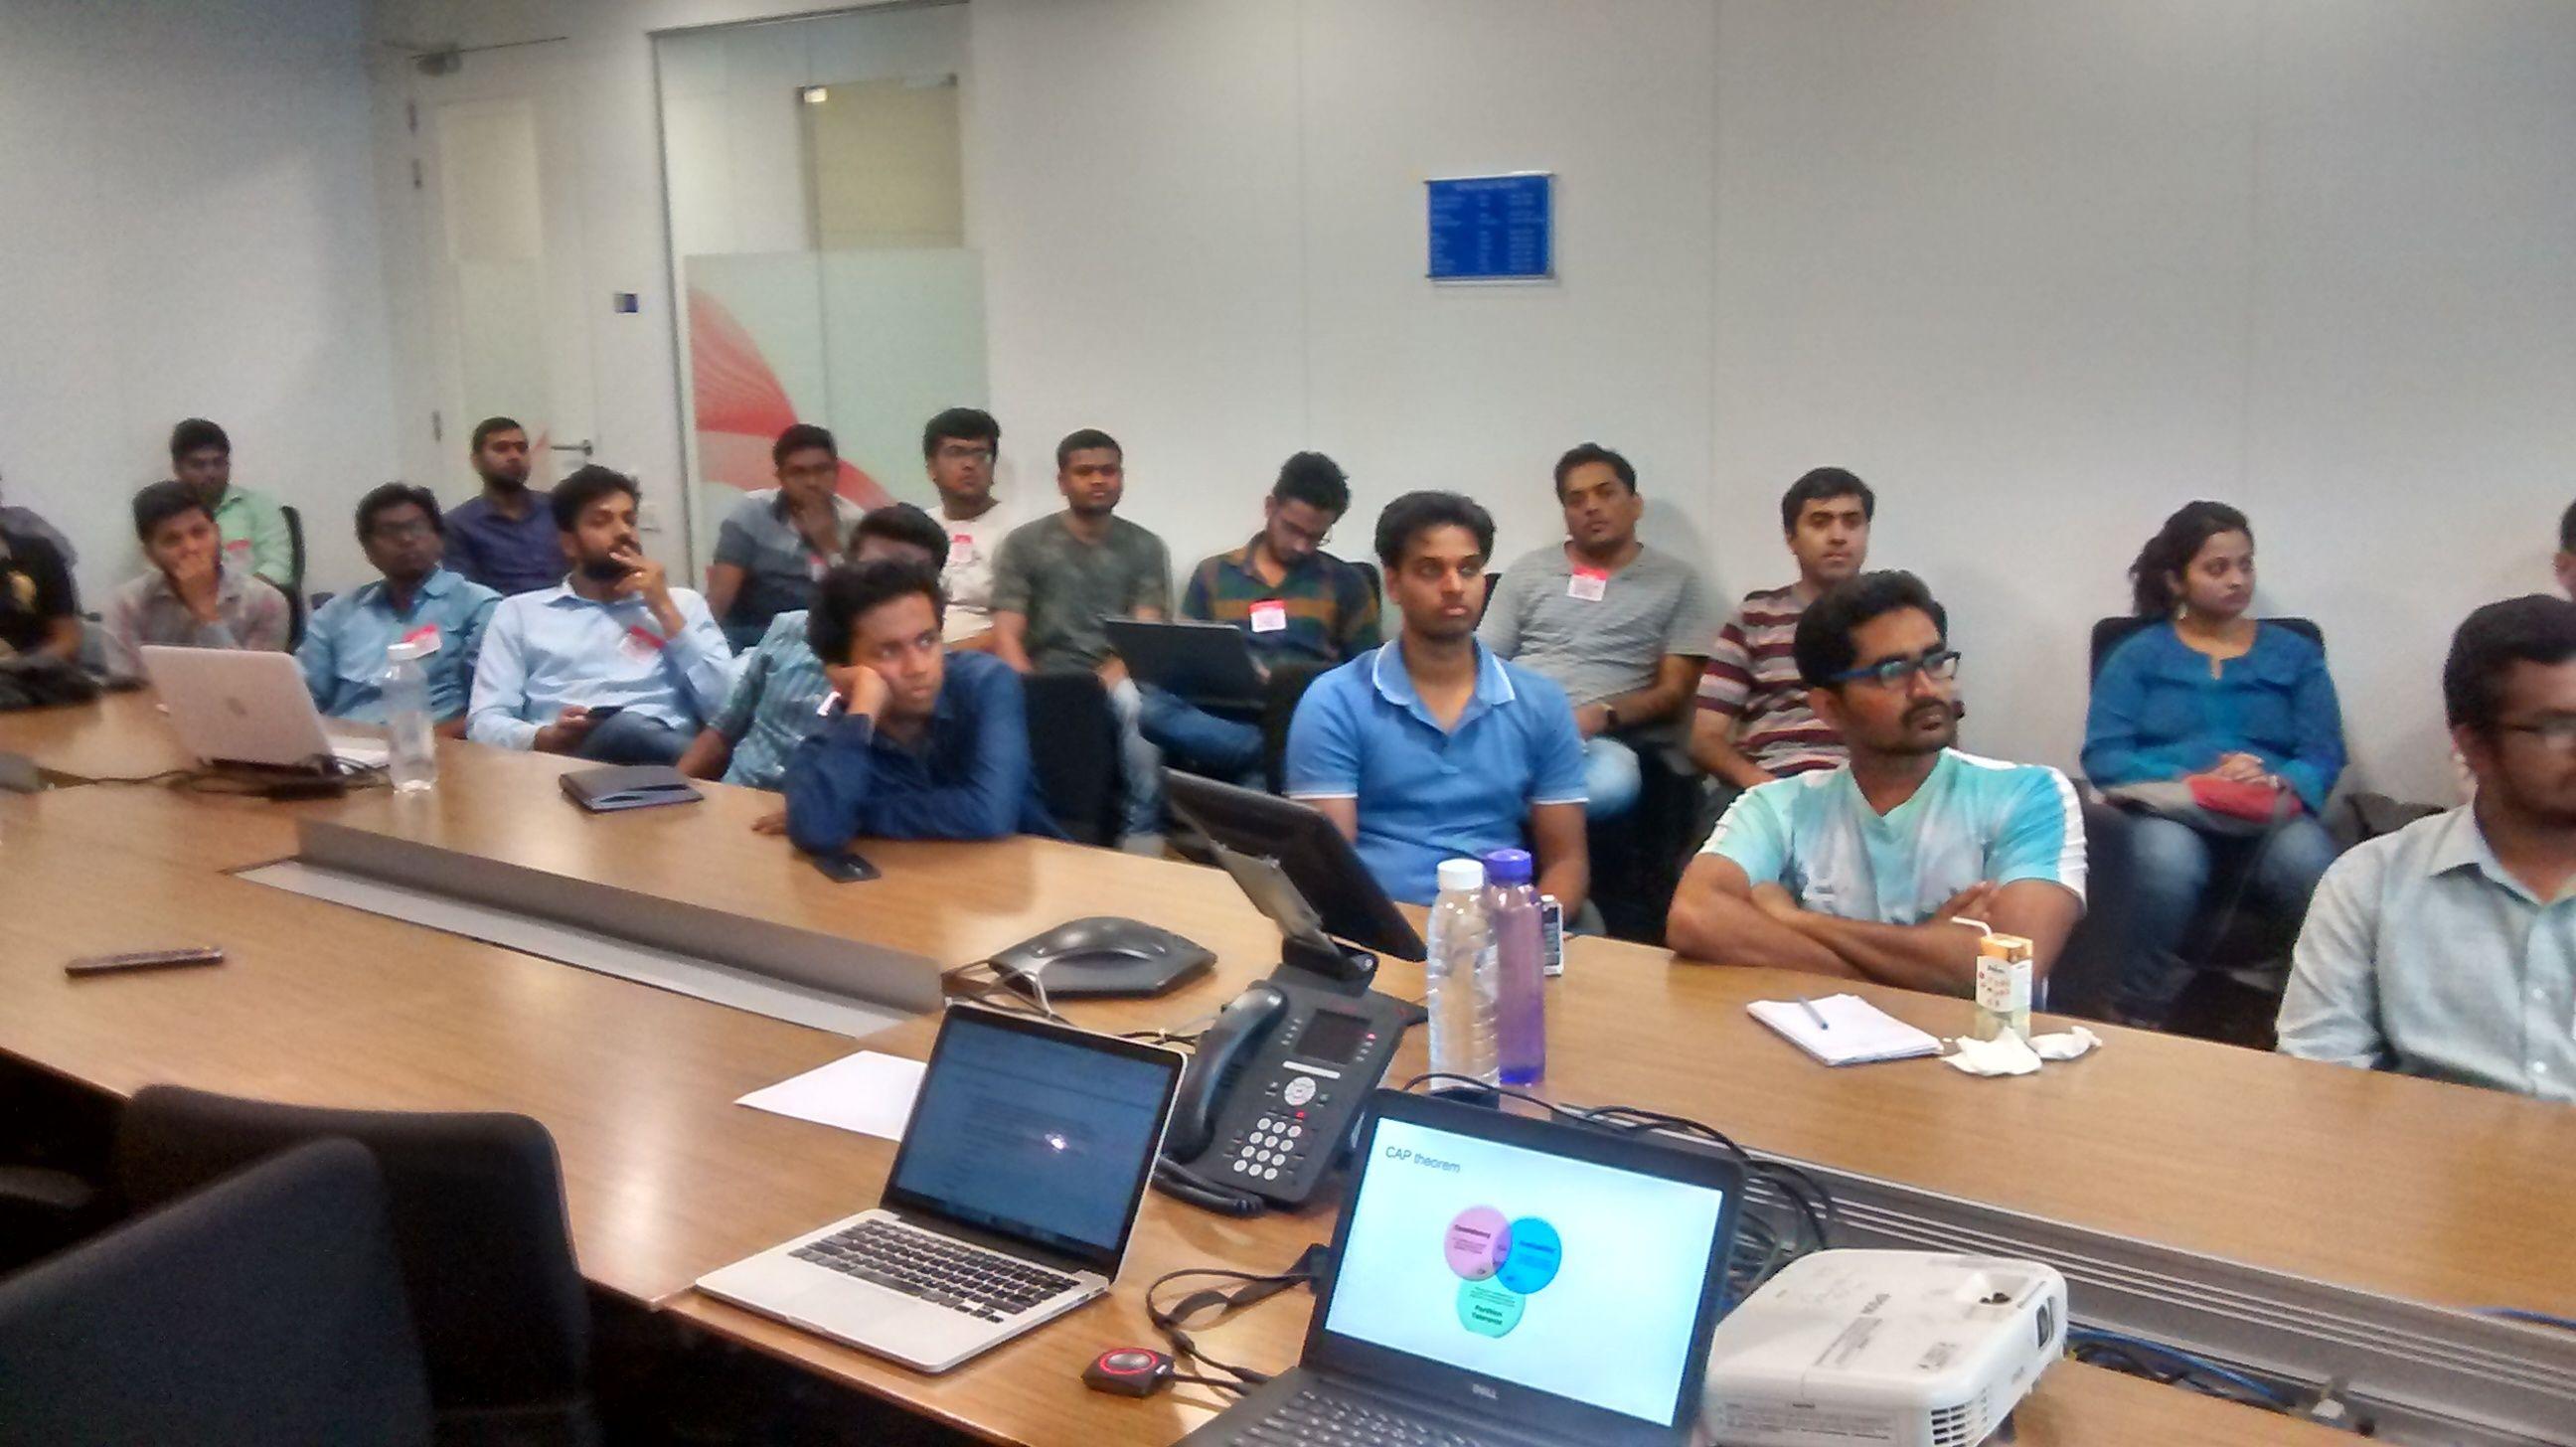 Java Meetup - Bangalore